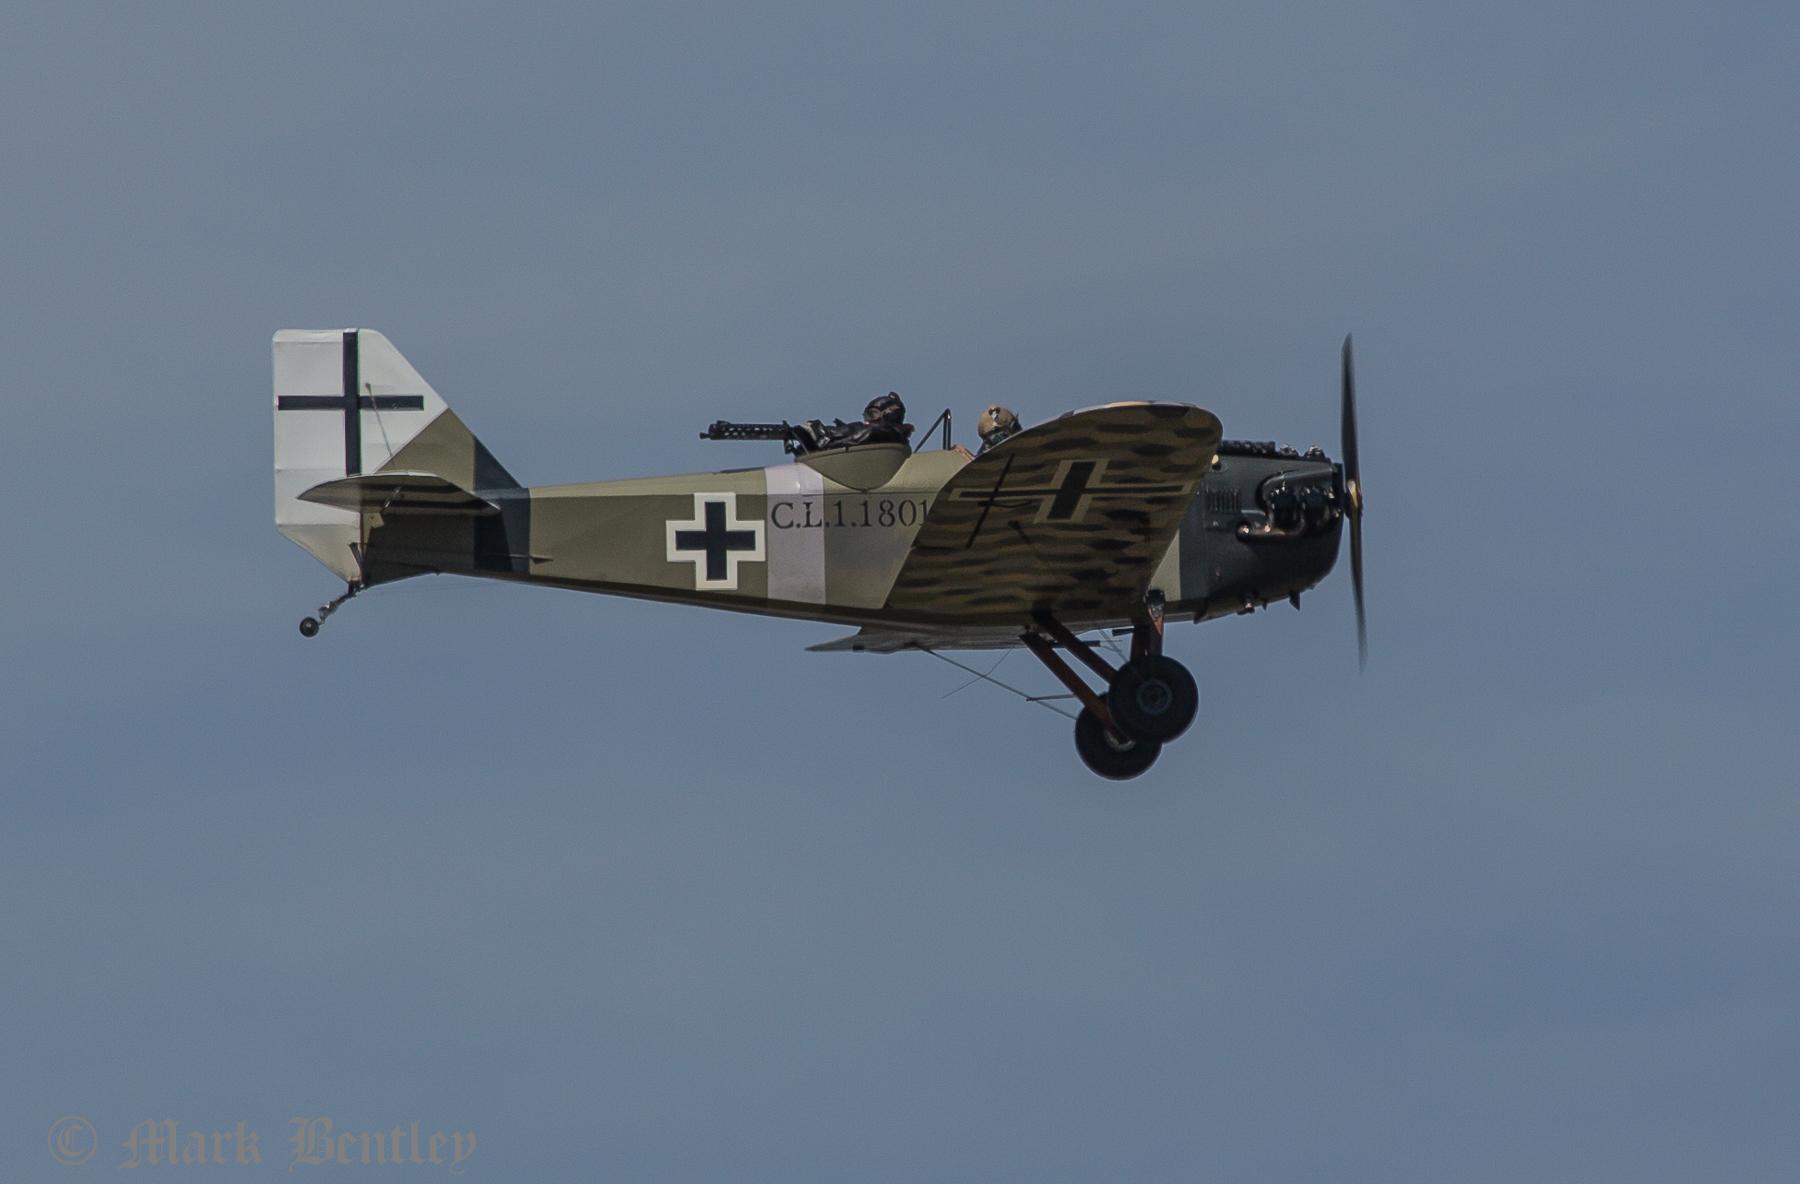 D010 Junkers Cl1